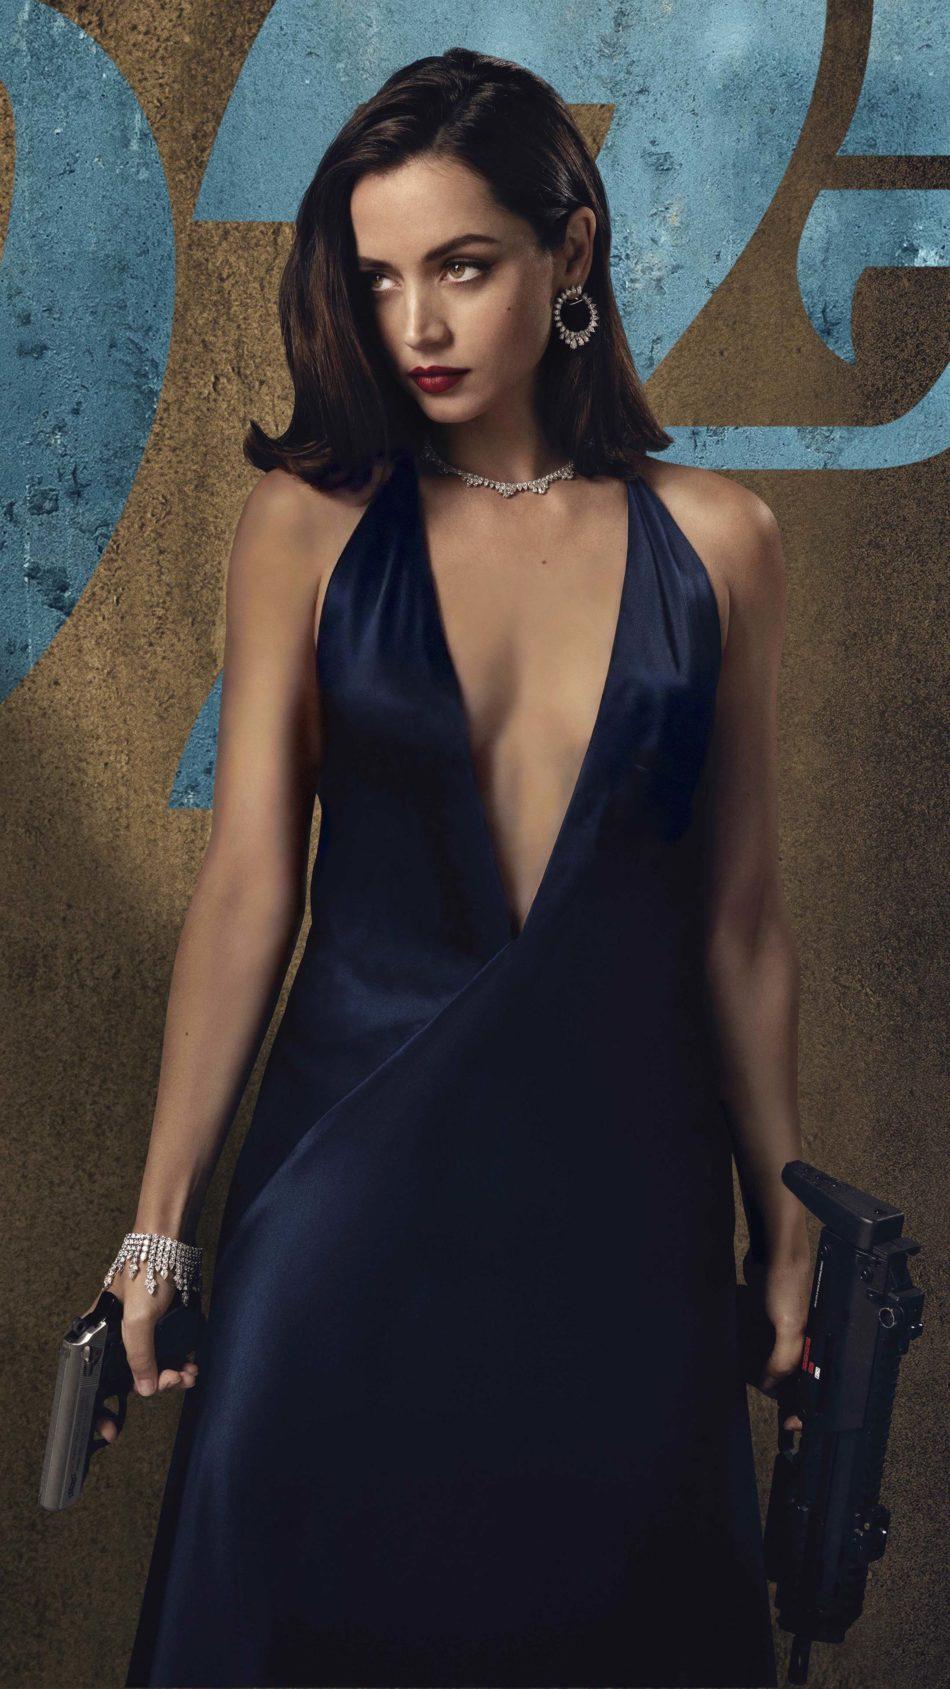 Ana de Armas In No Time To Die 4K Ultra HD Mobile Wallpaper